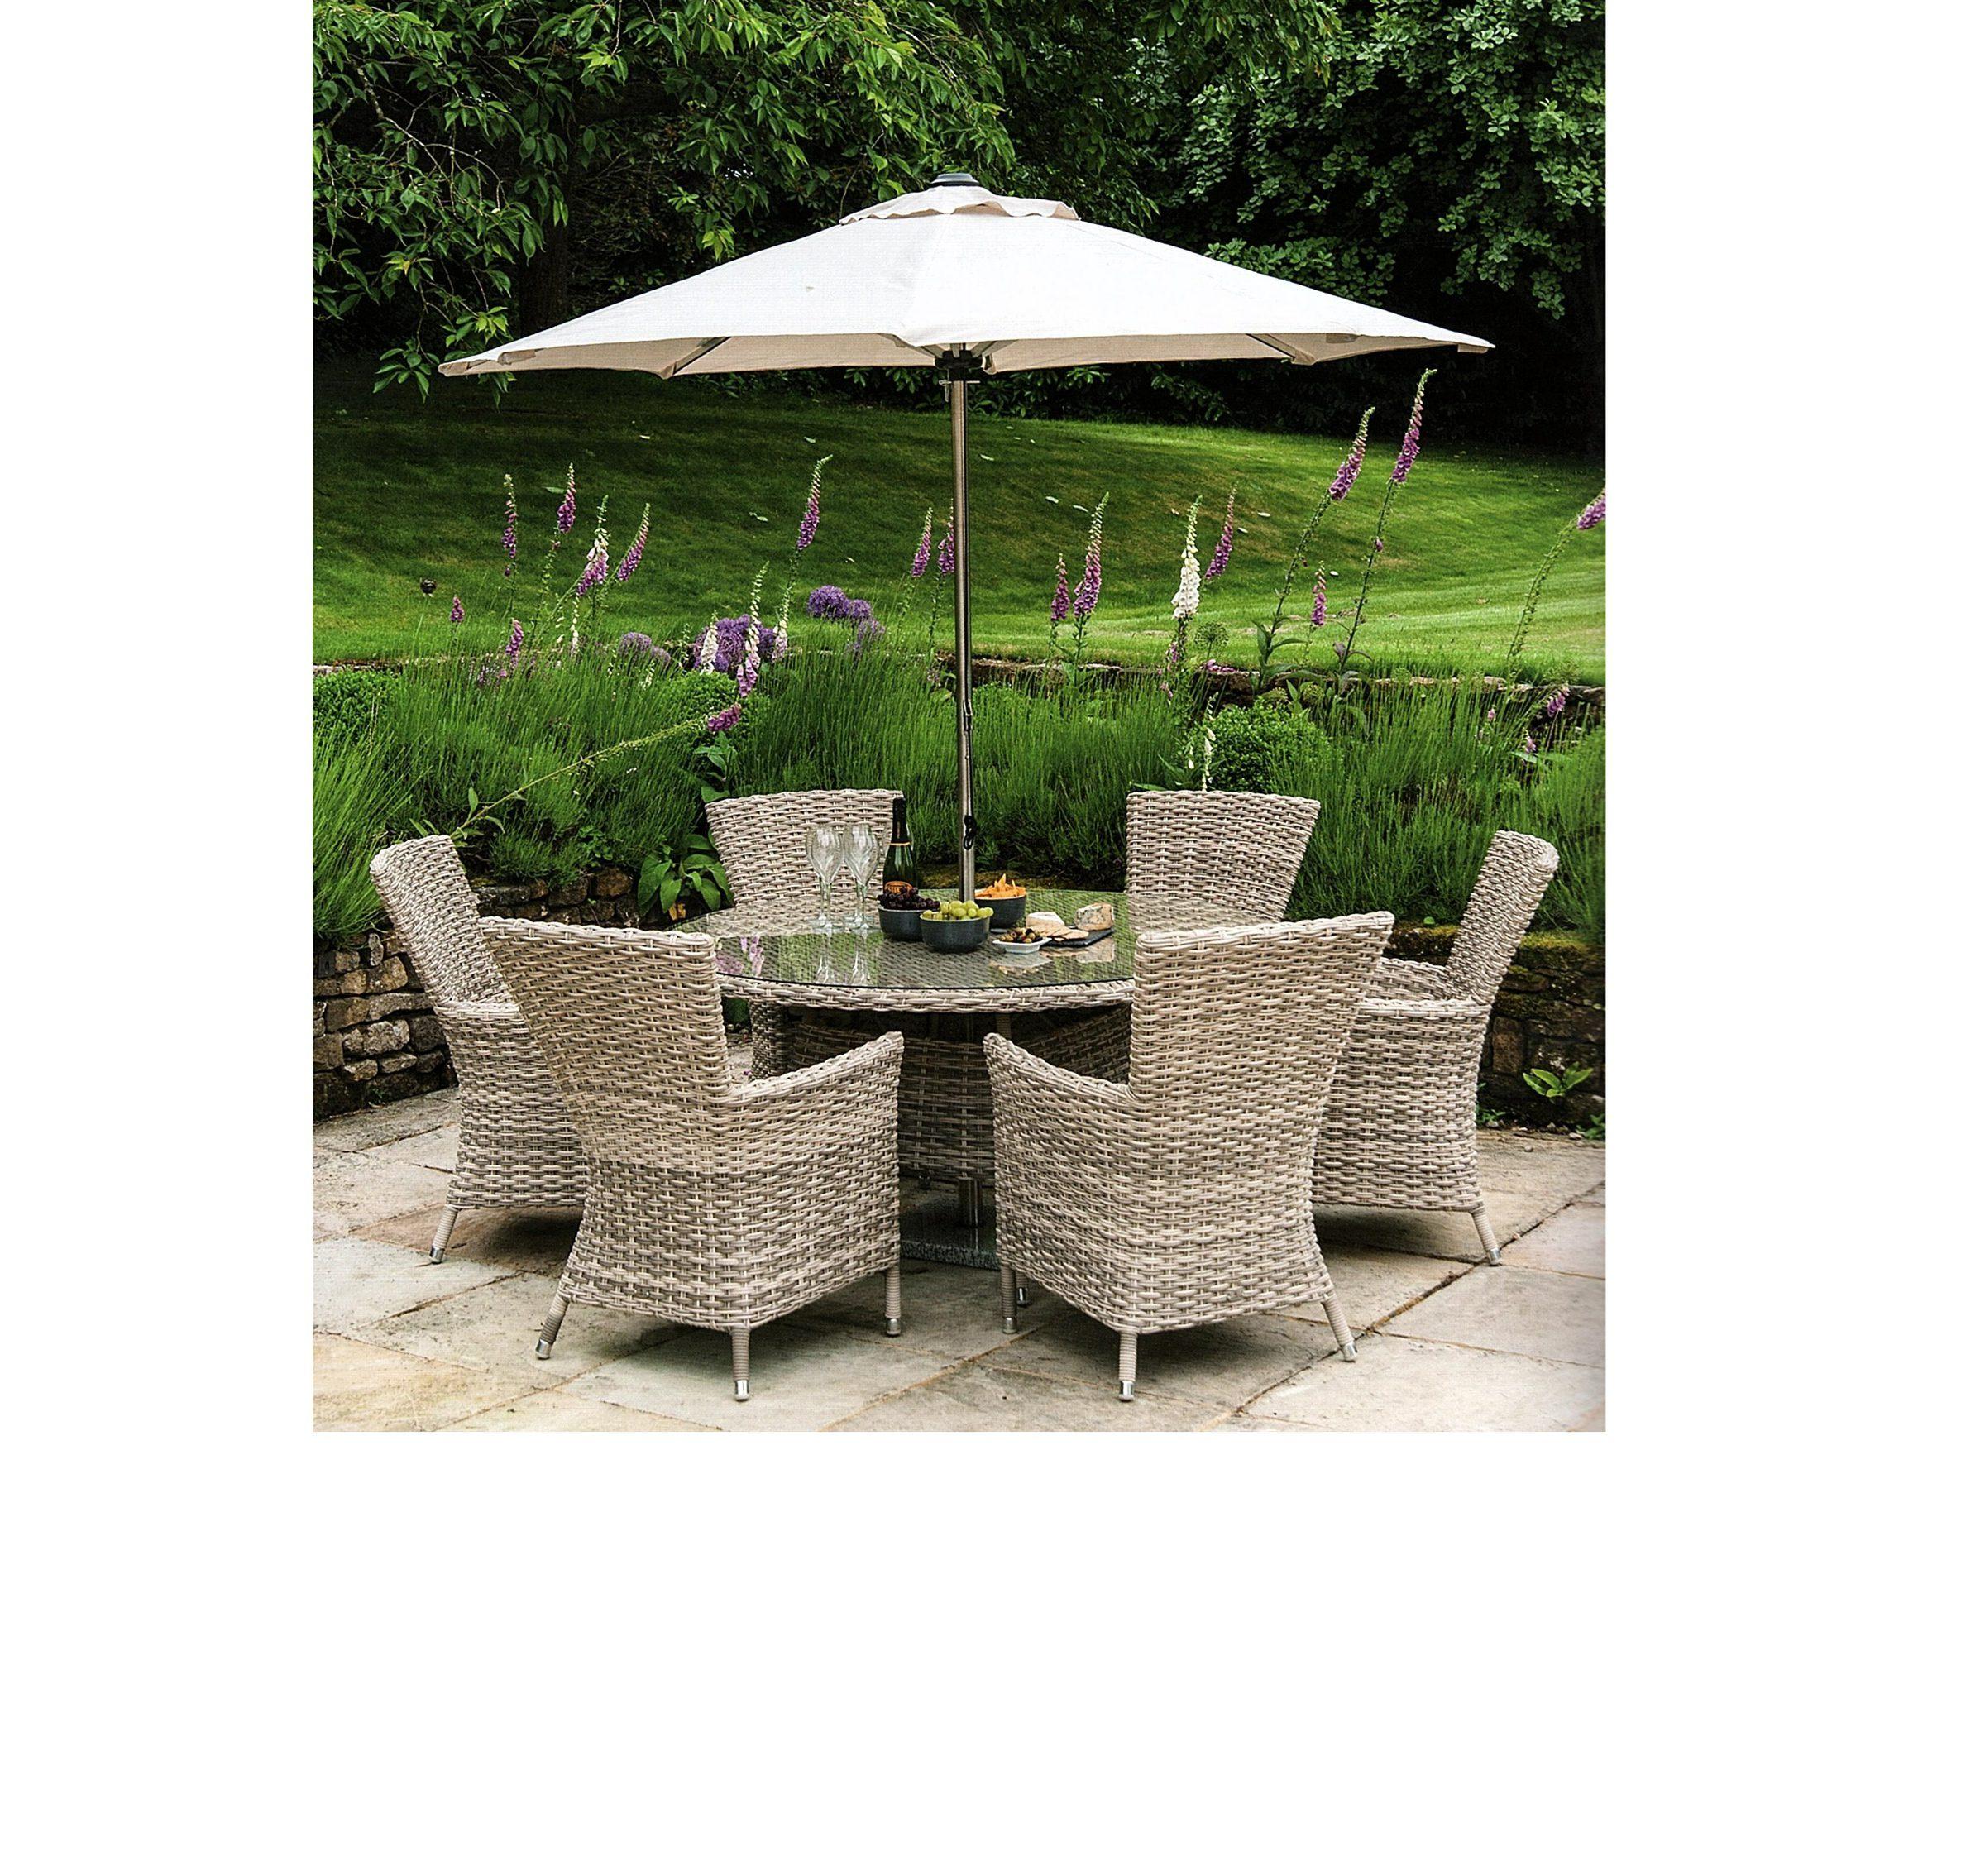 Kool Pearl 1.5m round furniture set